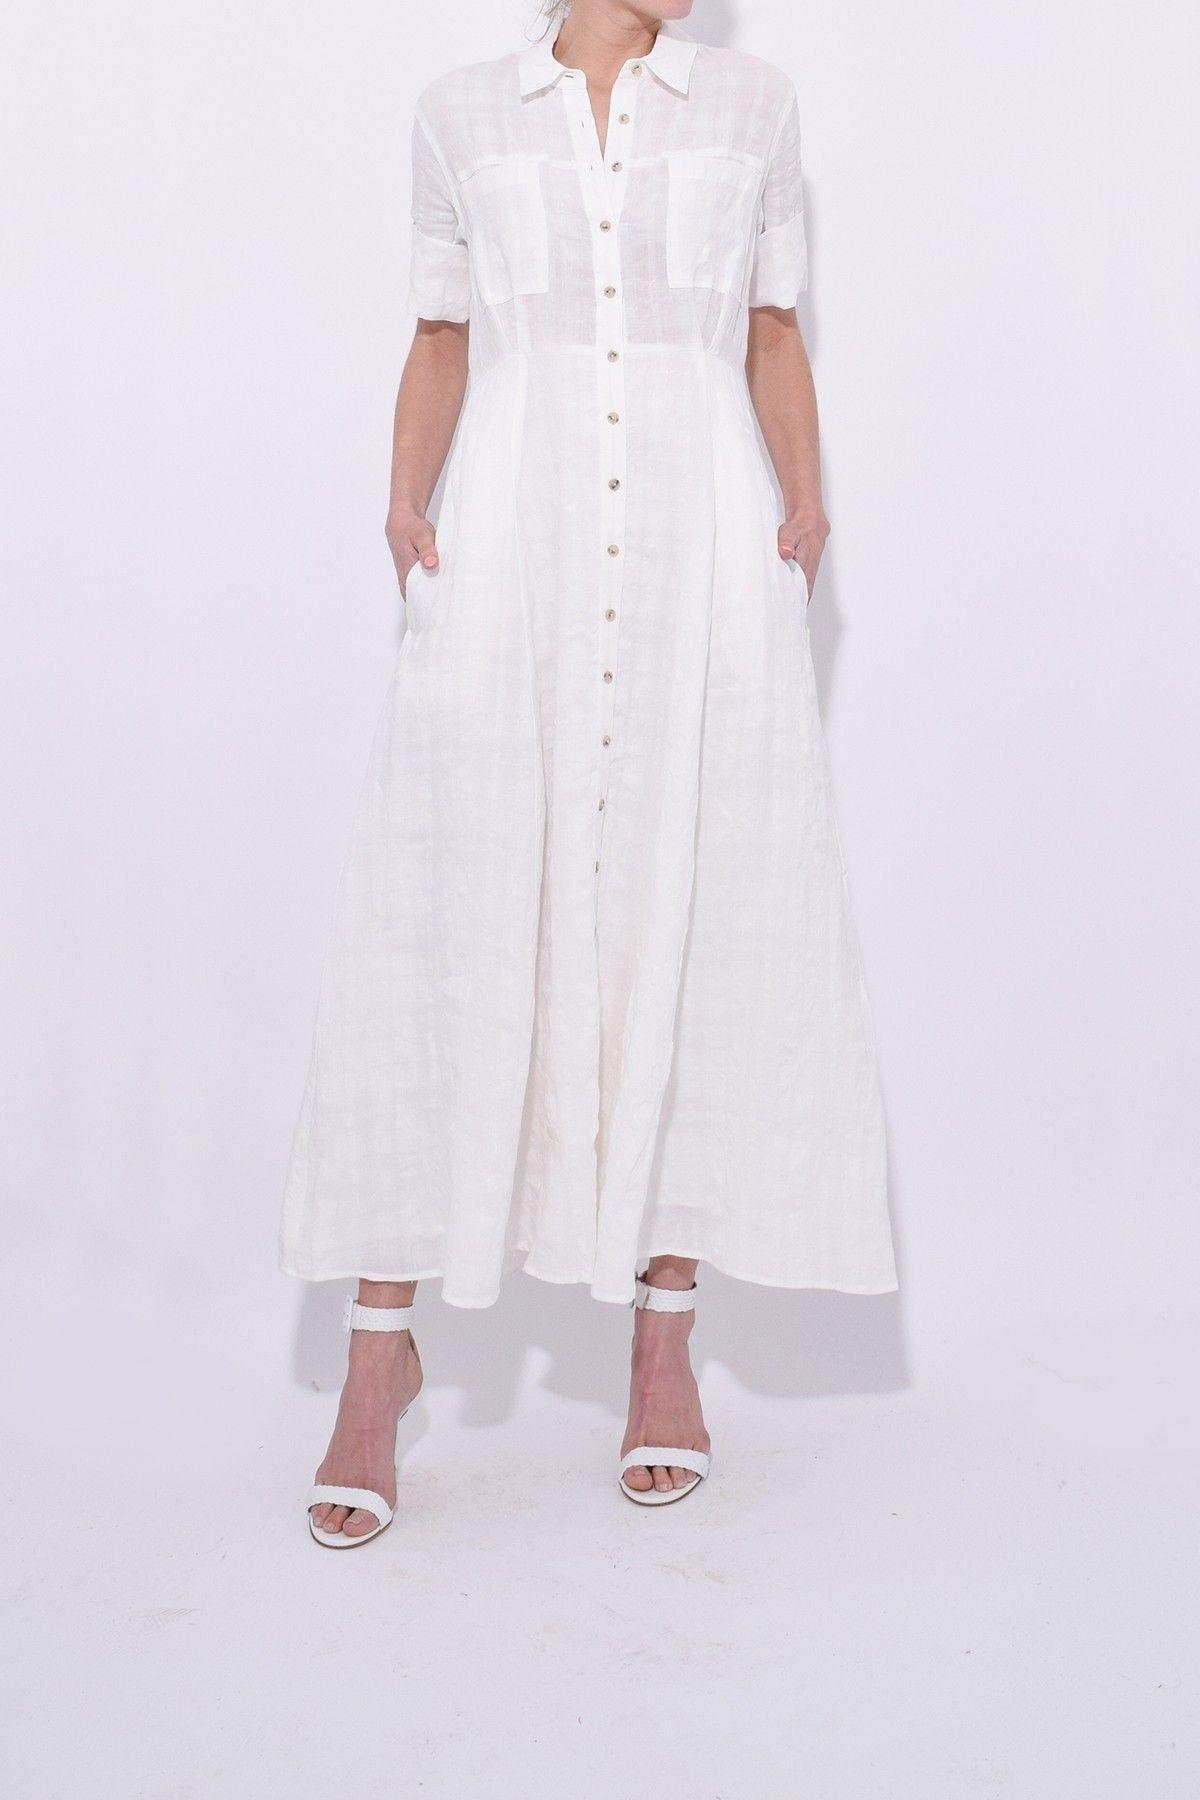 09b0f2449827 Lorelei Dress in White in 2019 | Hampden Dresses | White dress ...